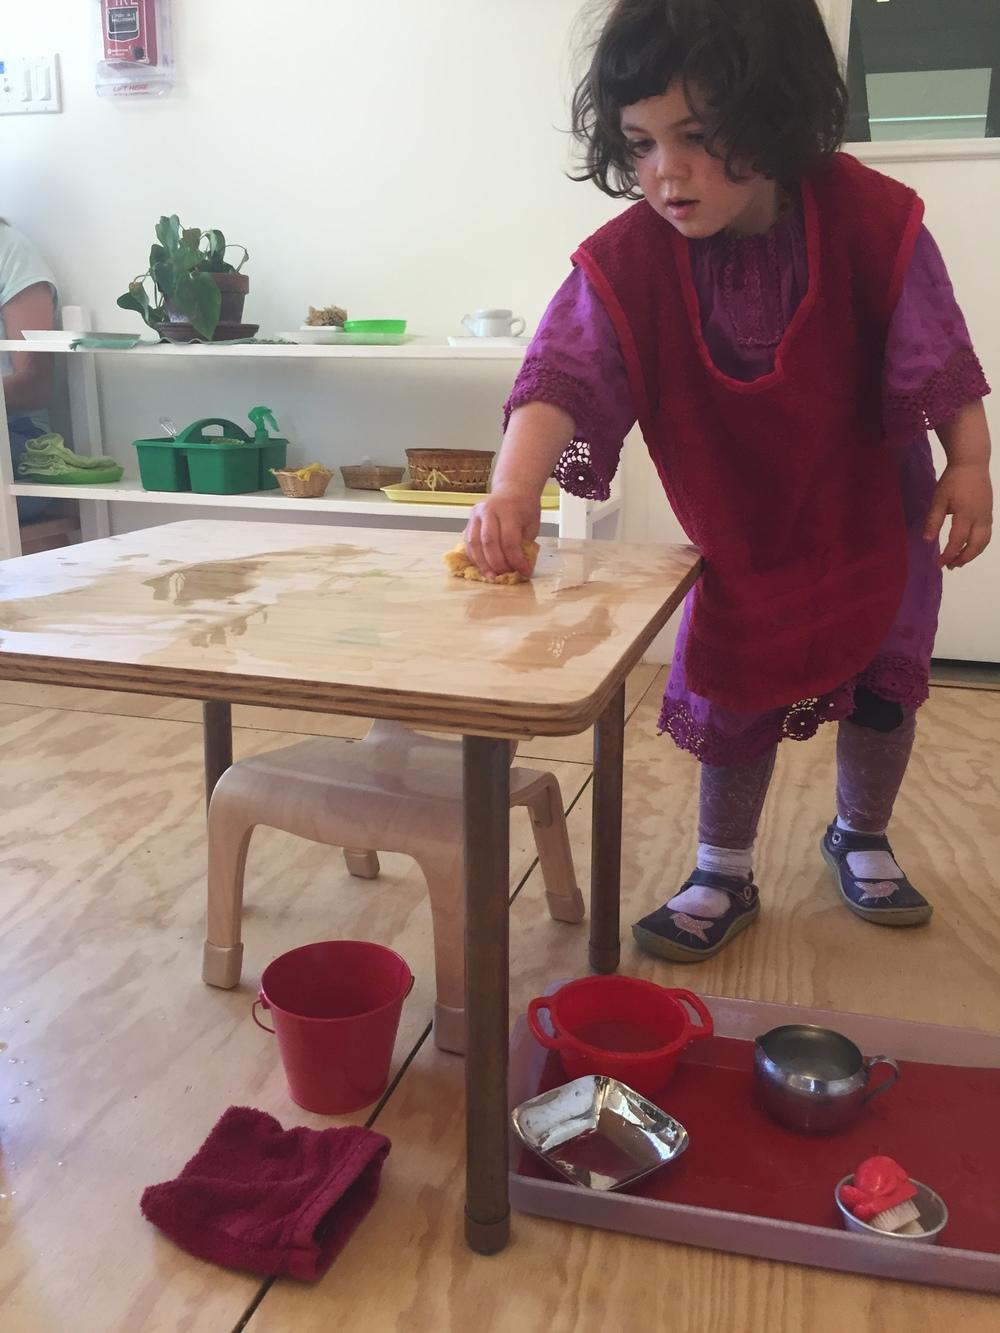 aria scrubbnig table.JPG